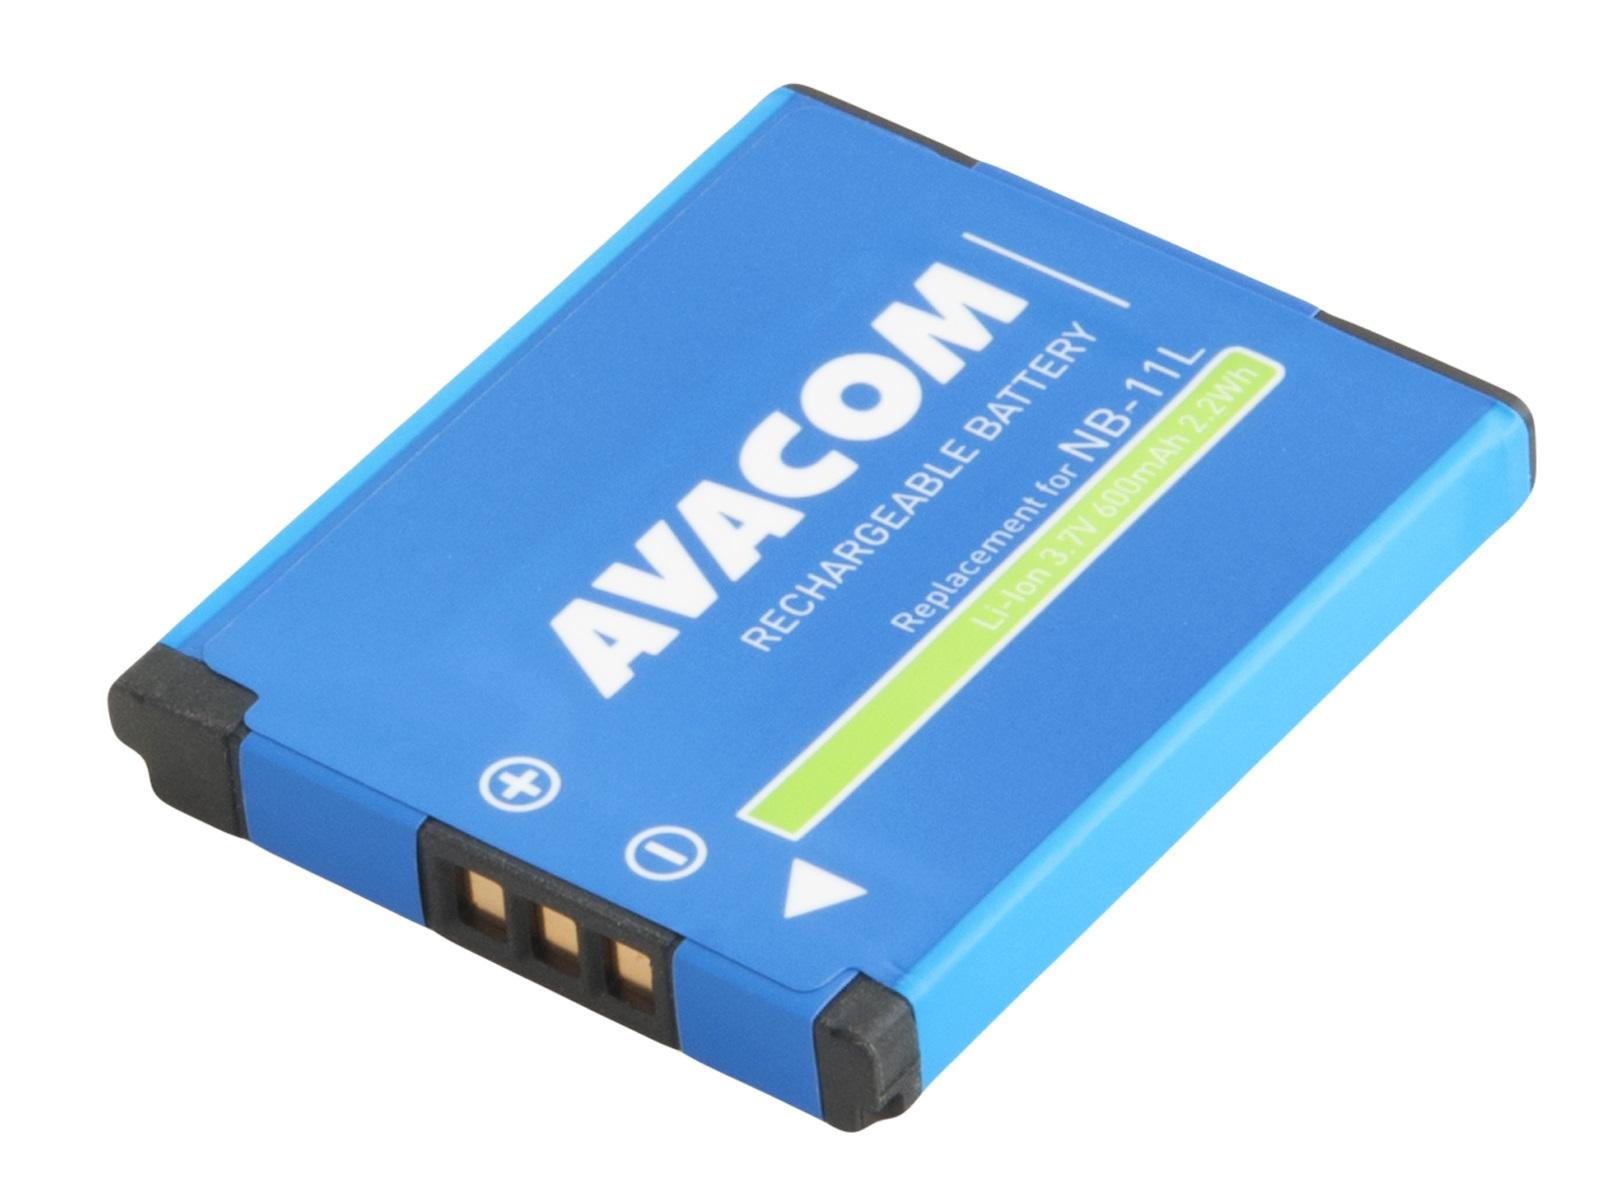 AVACOM baterie Canon NB-11L, NB-11LH Li-Ion 3.7V 600mAh 2.2Wh NEW